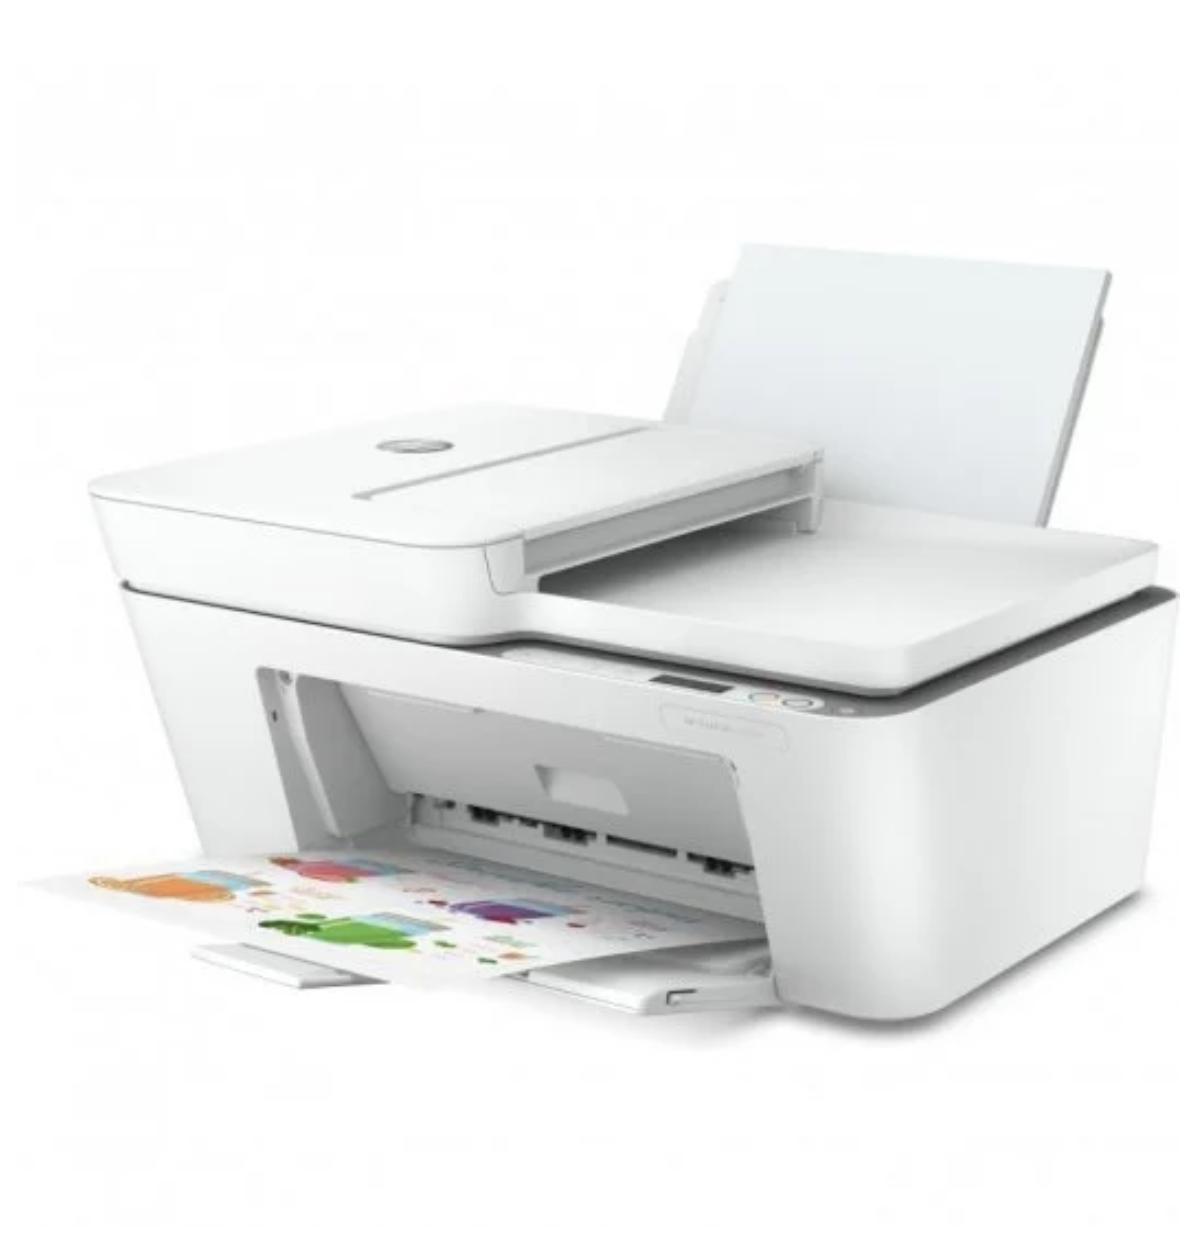 HP DeskJet 4120e Multifunción Color WiFi + 6 Meses de Impresión Instant Ink con HP + HP 305XL